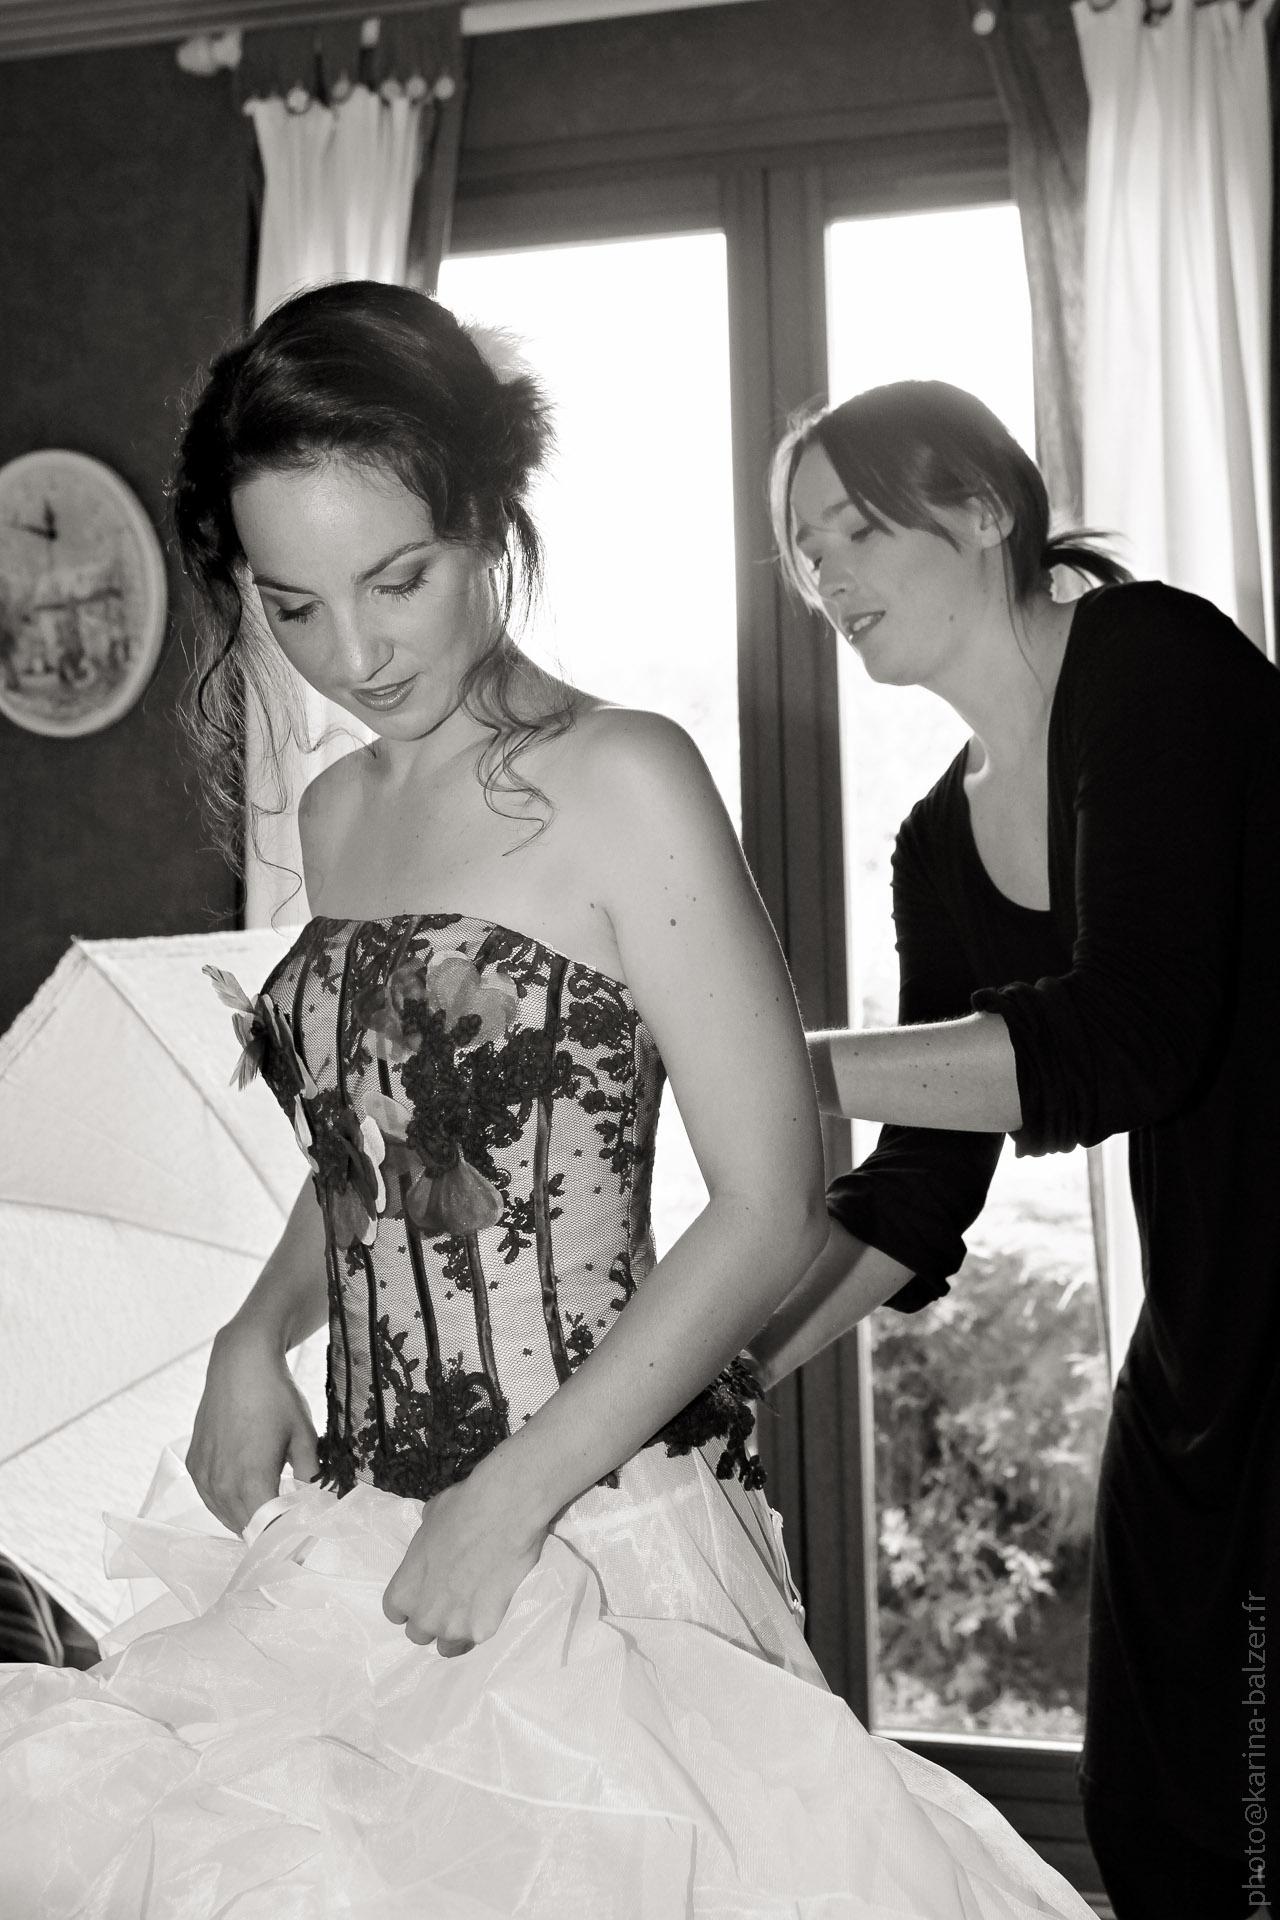 Très Mariage Noir et Blanc | Karina Balzer CR71